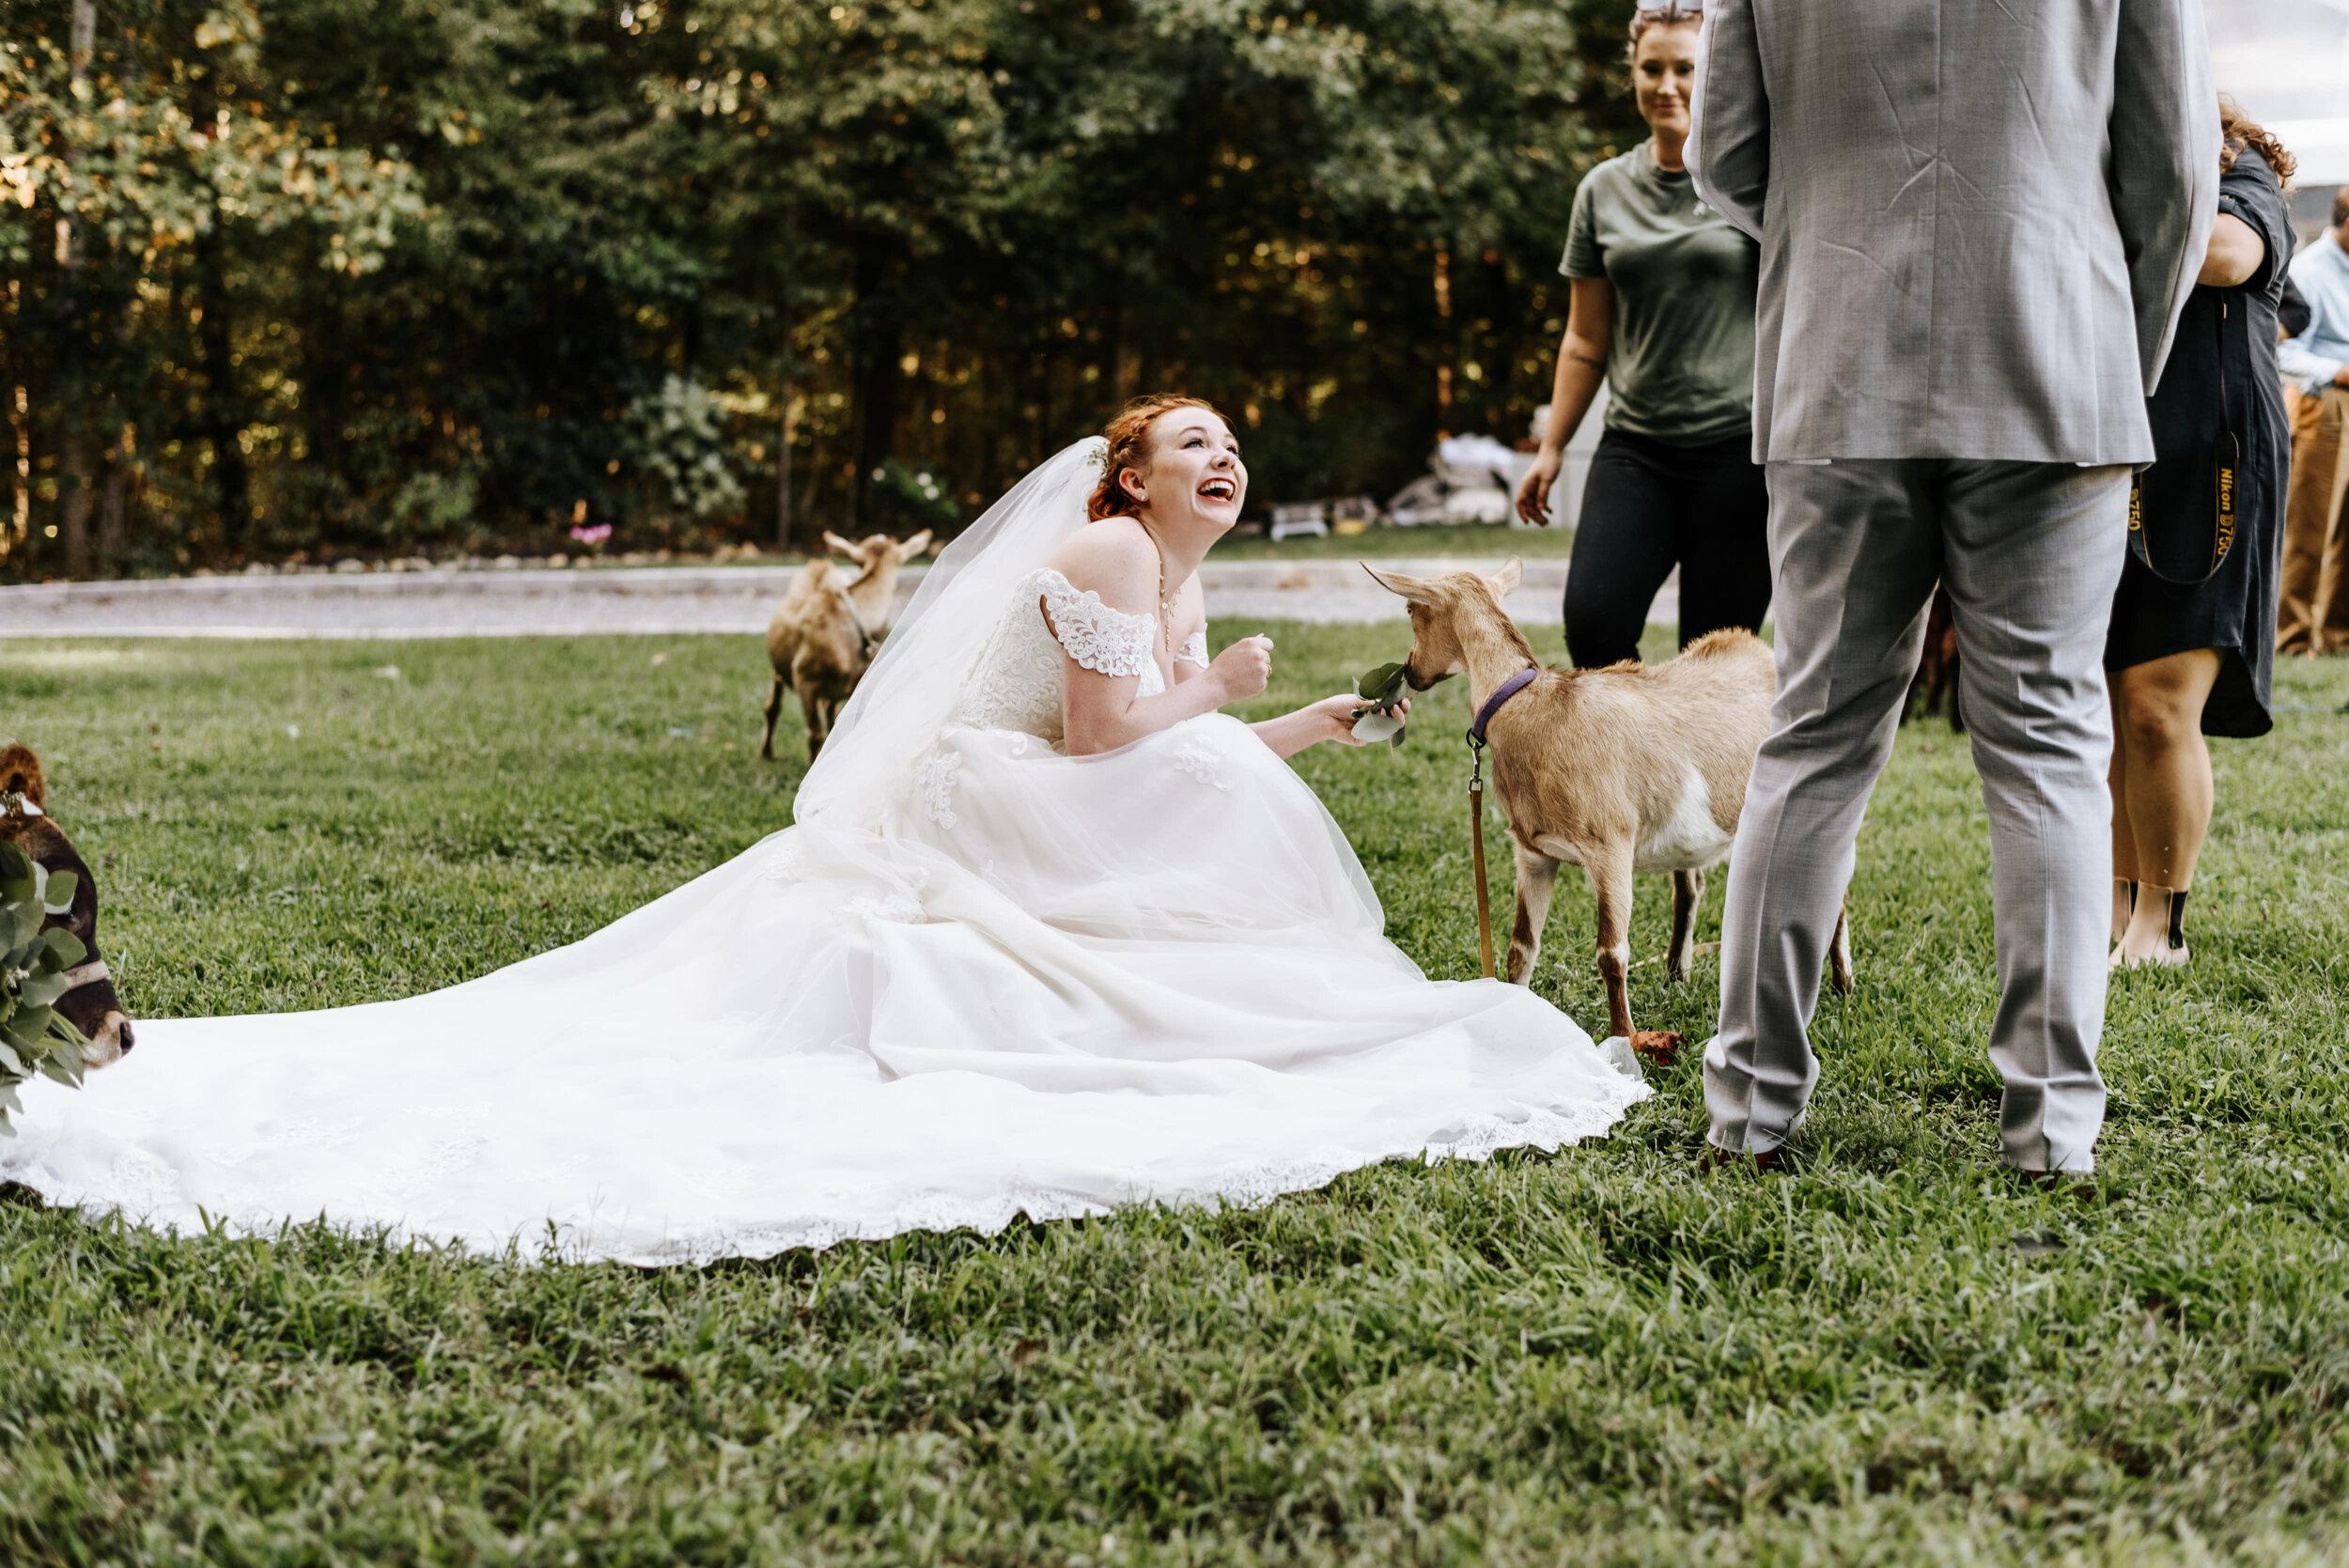 Rachel_David_Wedding_Richmond_Virginia_Photography_by_V_31.jpg